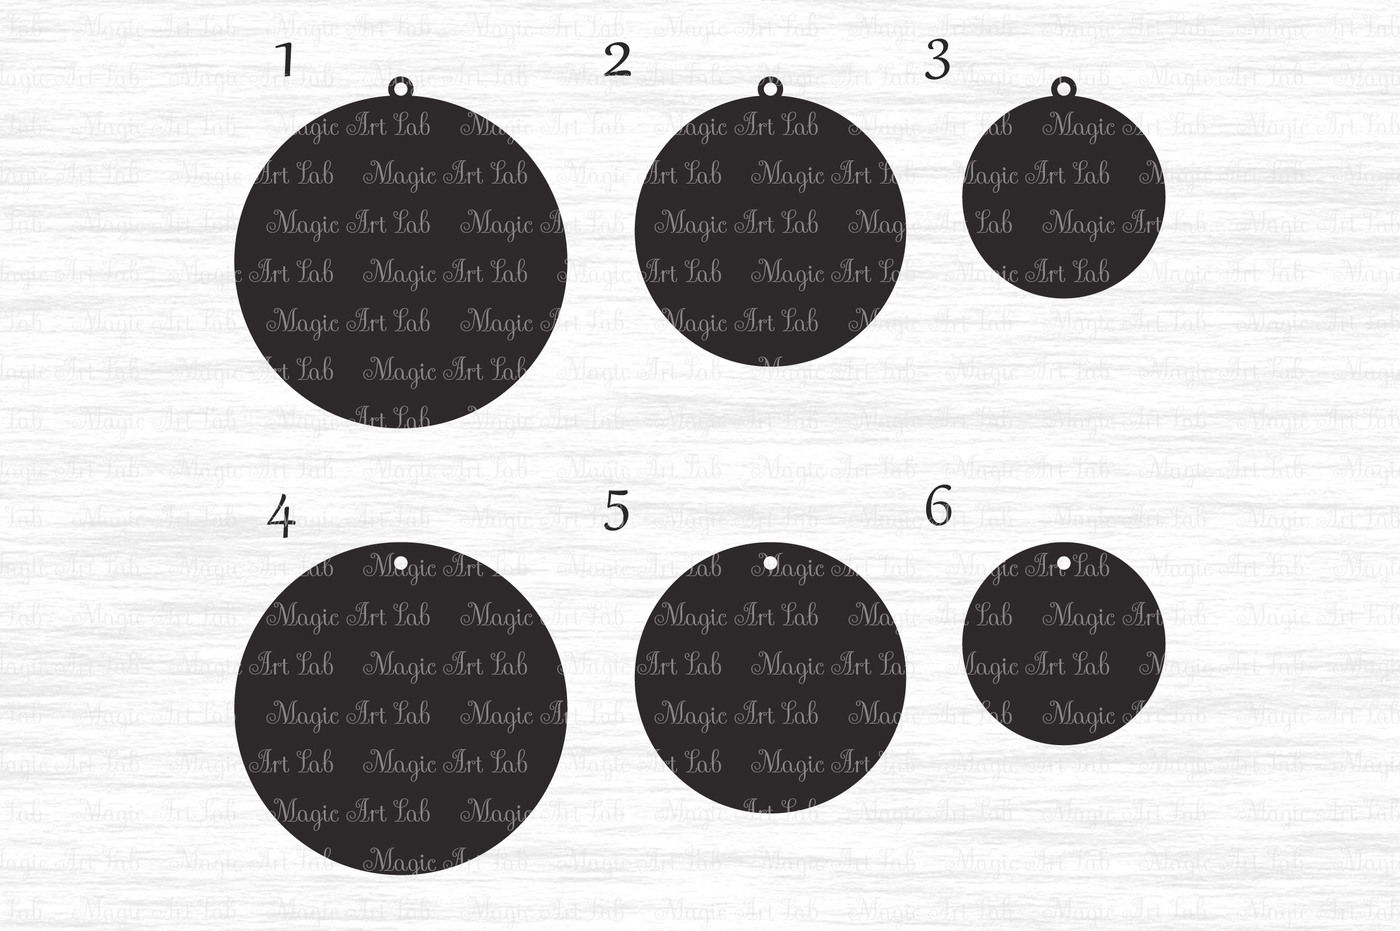 Circle Earrings Svg Dxf Eps Ai Png Pdf Jpeg By Magicartlab